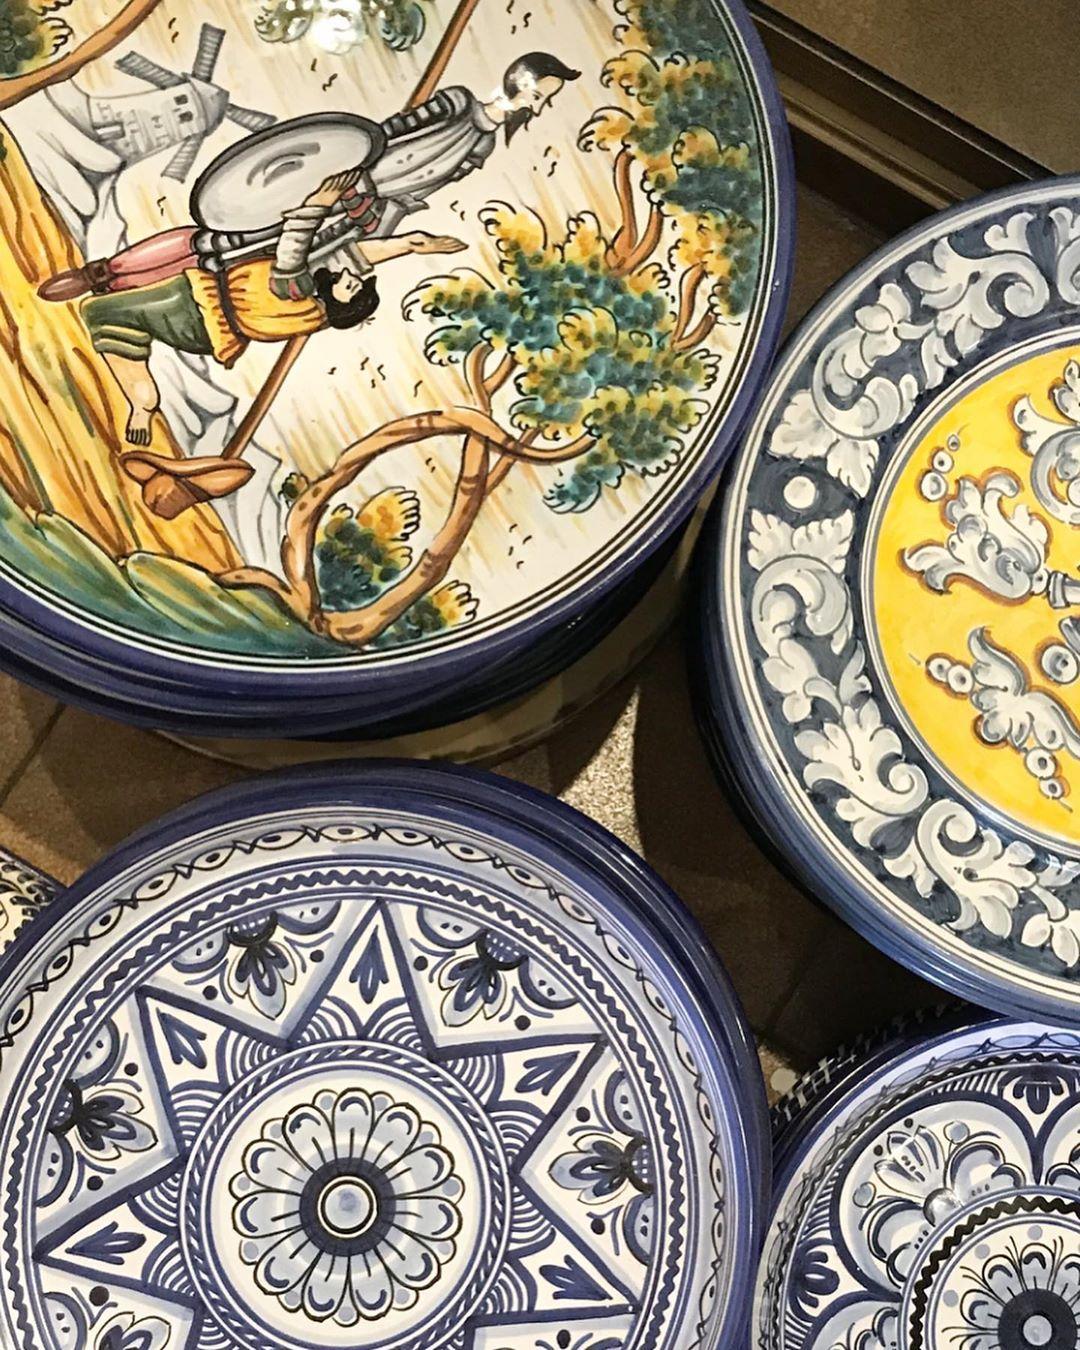 My favorite ceramics store in Mijas Artesania de Espana 1   A lot of Don Quijote motivs after Europes first novel writer Spanish Cervantes different